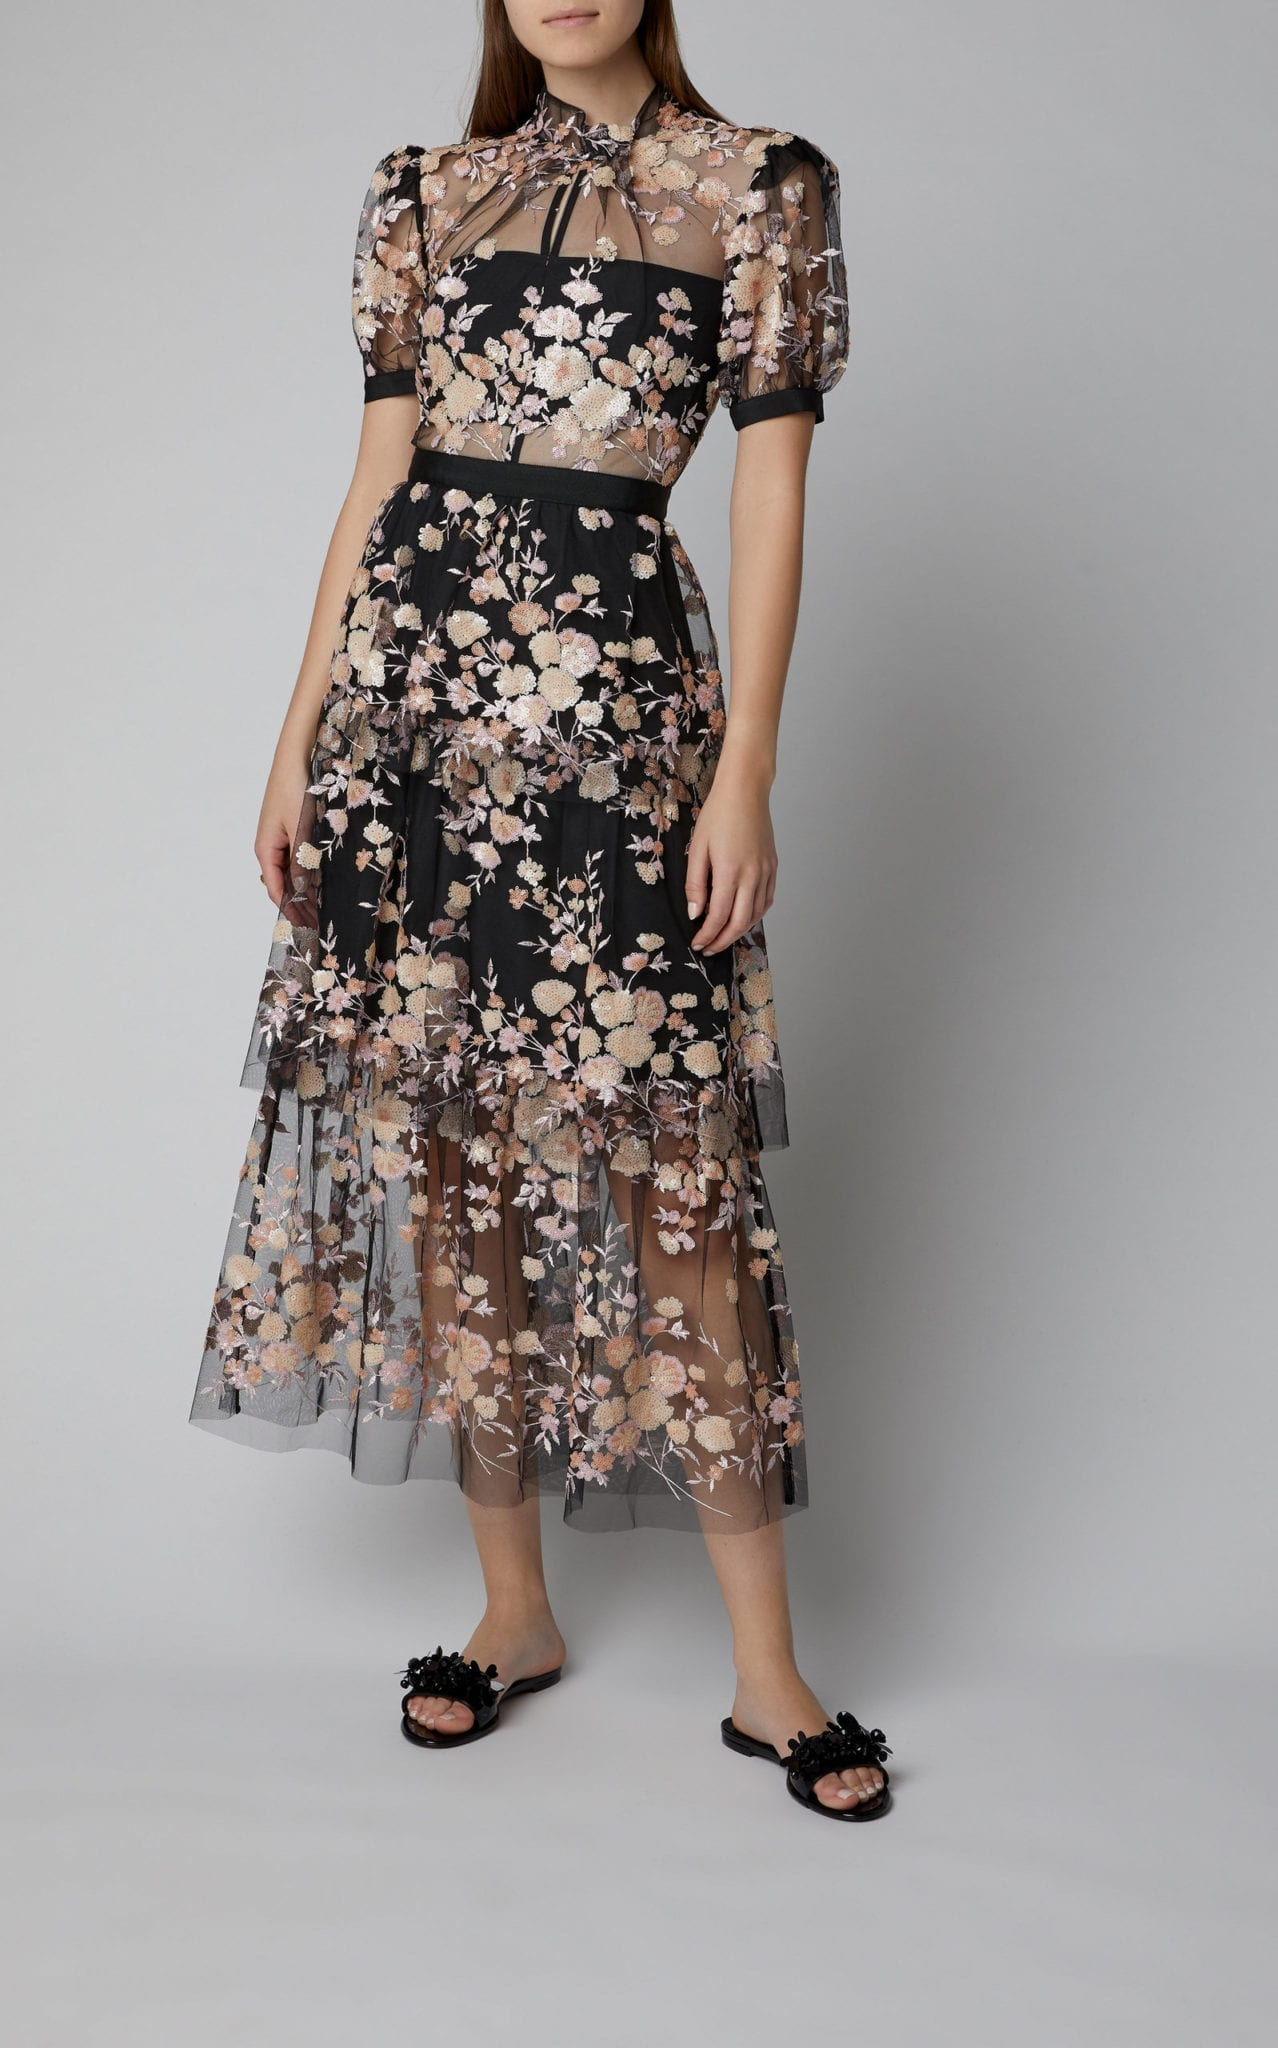 SELF PORTRAIT Floral-Embroidered Mesh Midi Dress